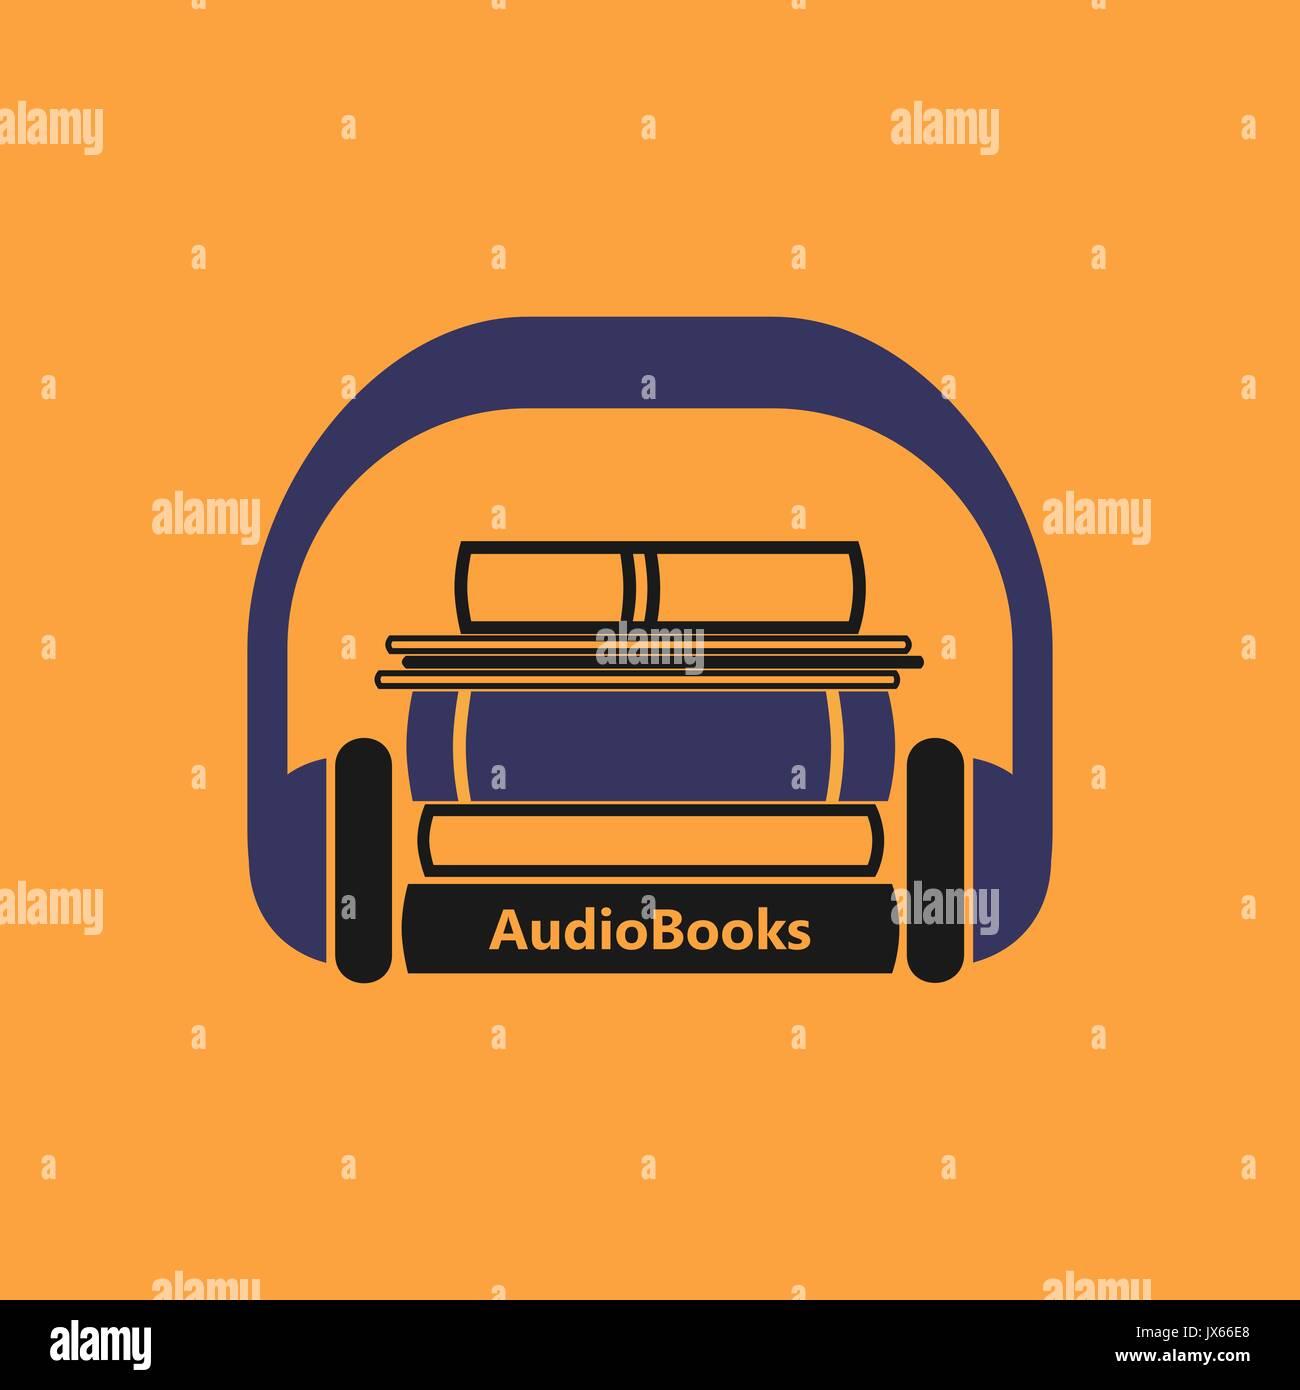 Audiobooks logo. Stylized vector emblem of books with headphone on a orange background. Stock Vector